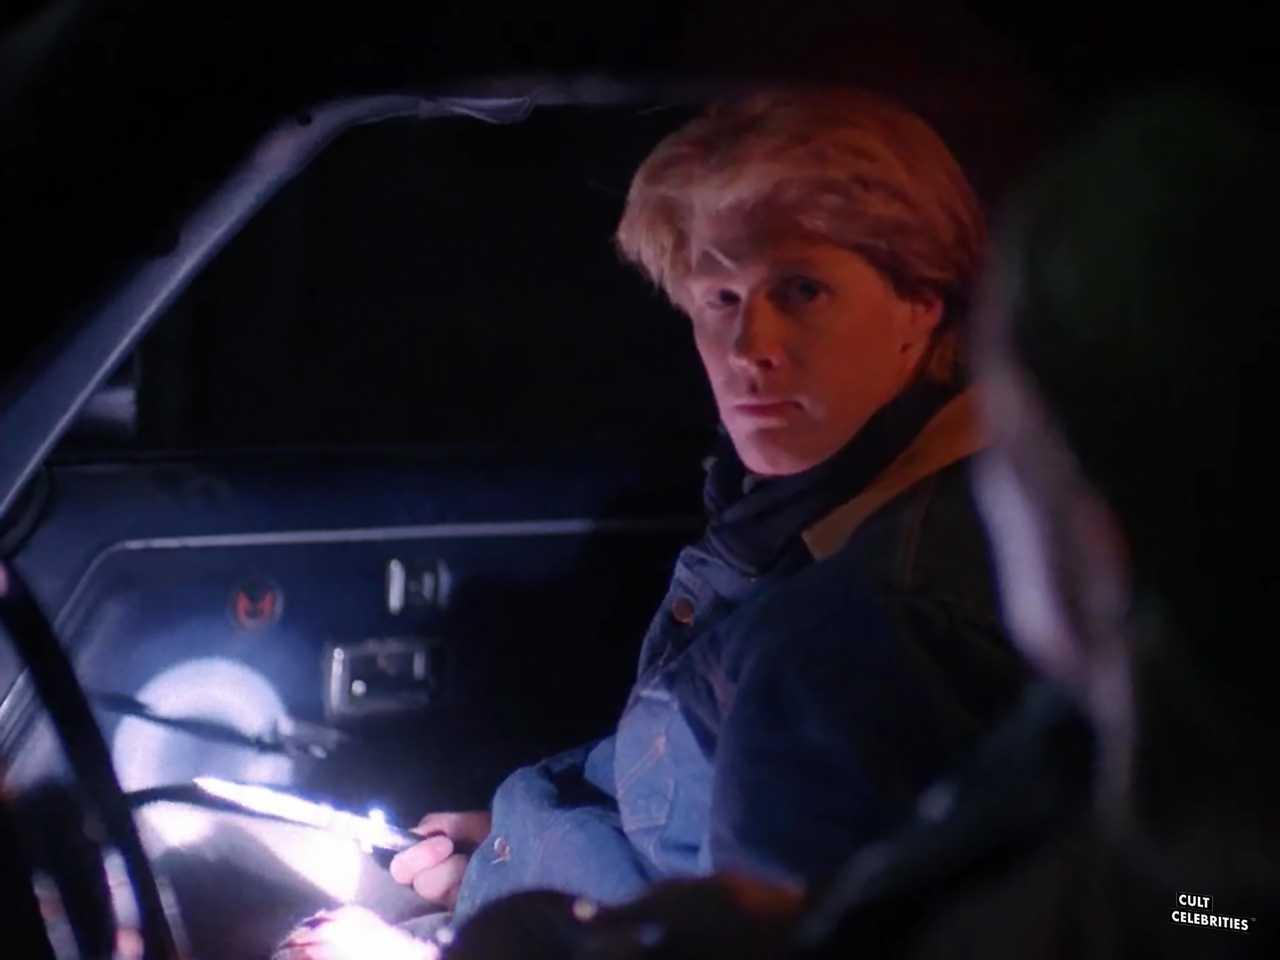 Gary Hershberger in Twin Peaks (1990)